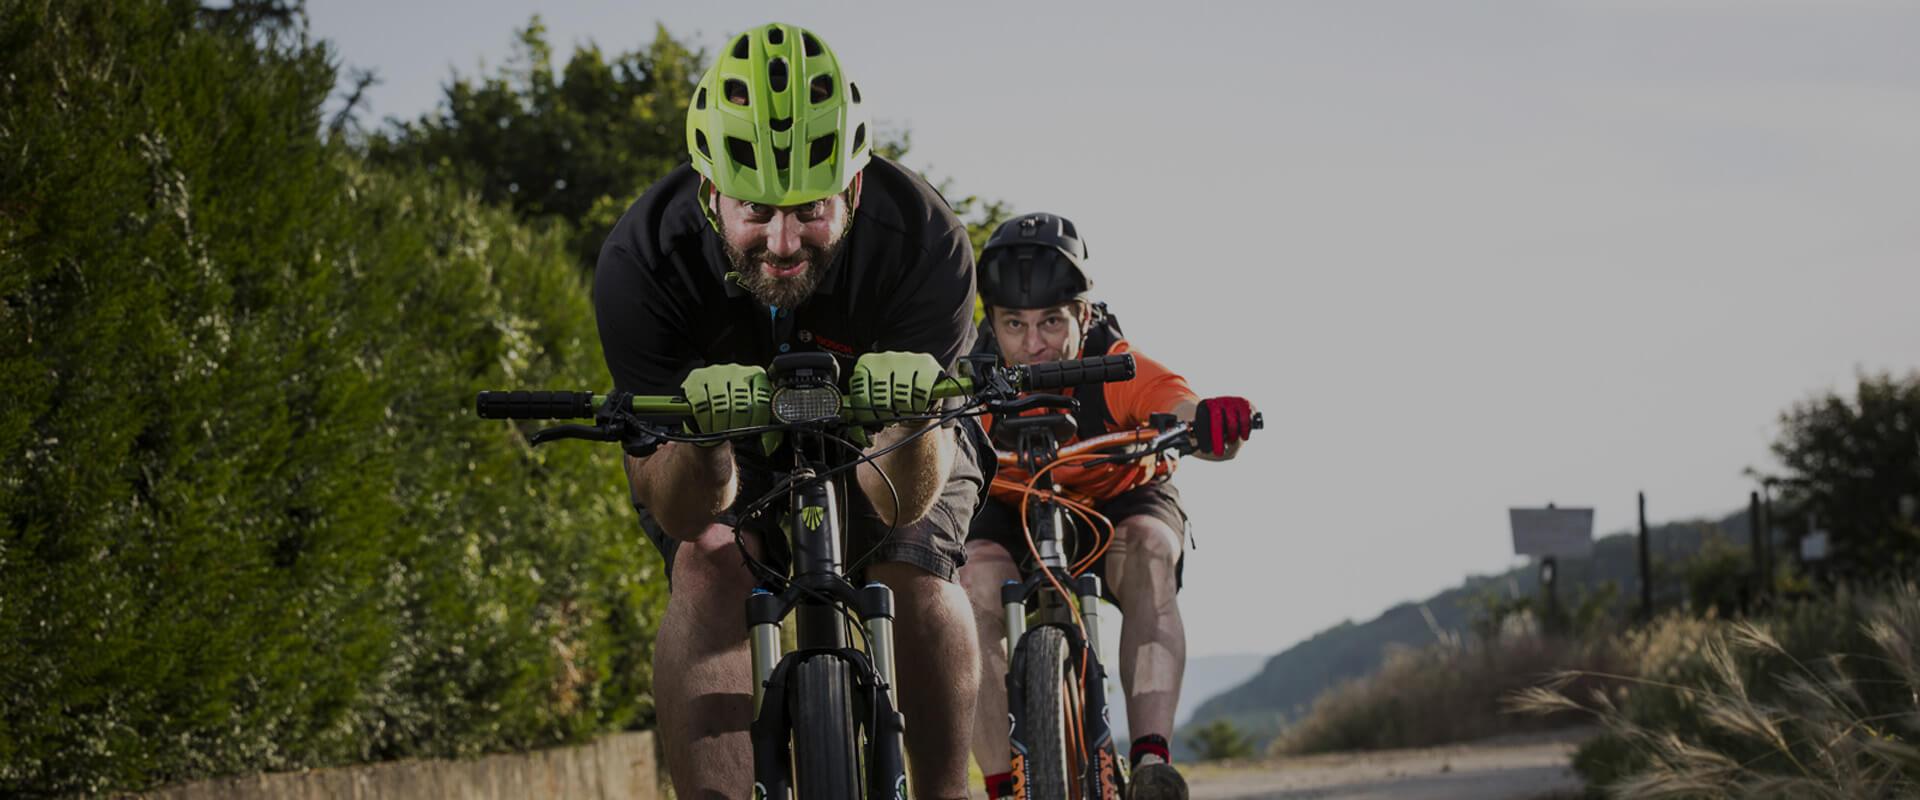 <strong>MarcoVelo sera absent pour semaine test vélo Du 07 Mai au 11 Mai inclus</strong>